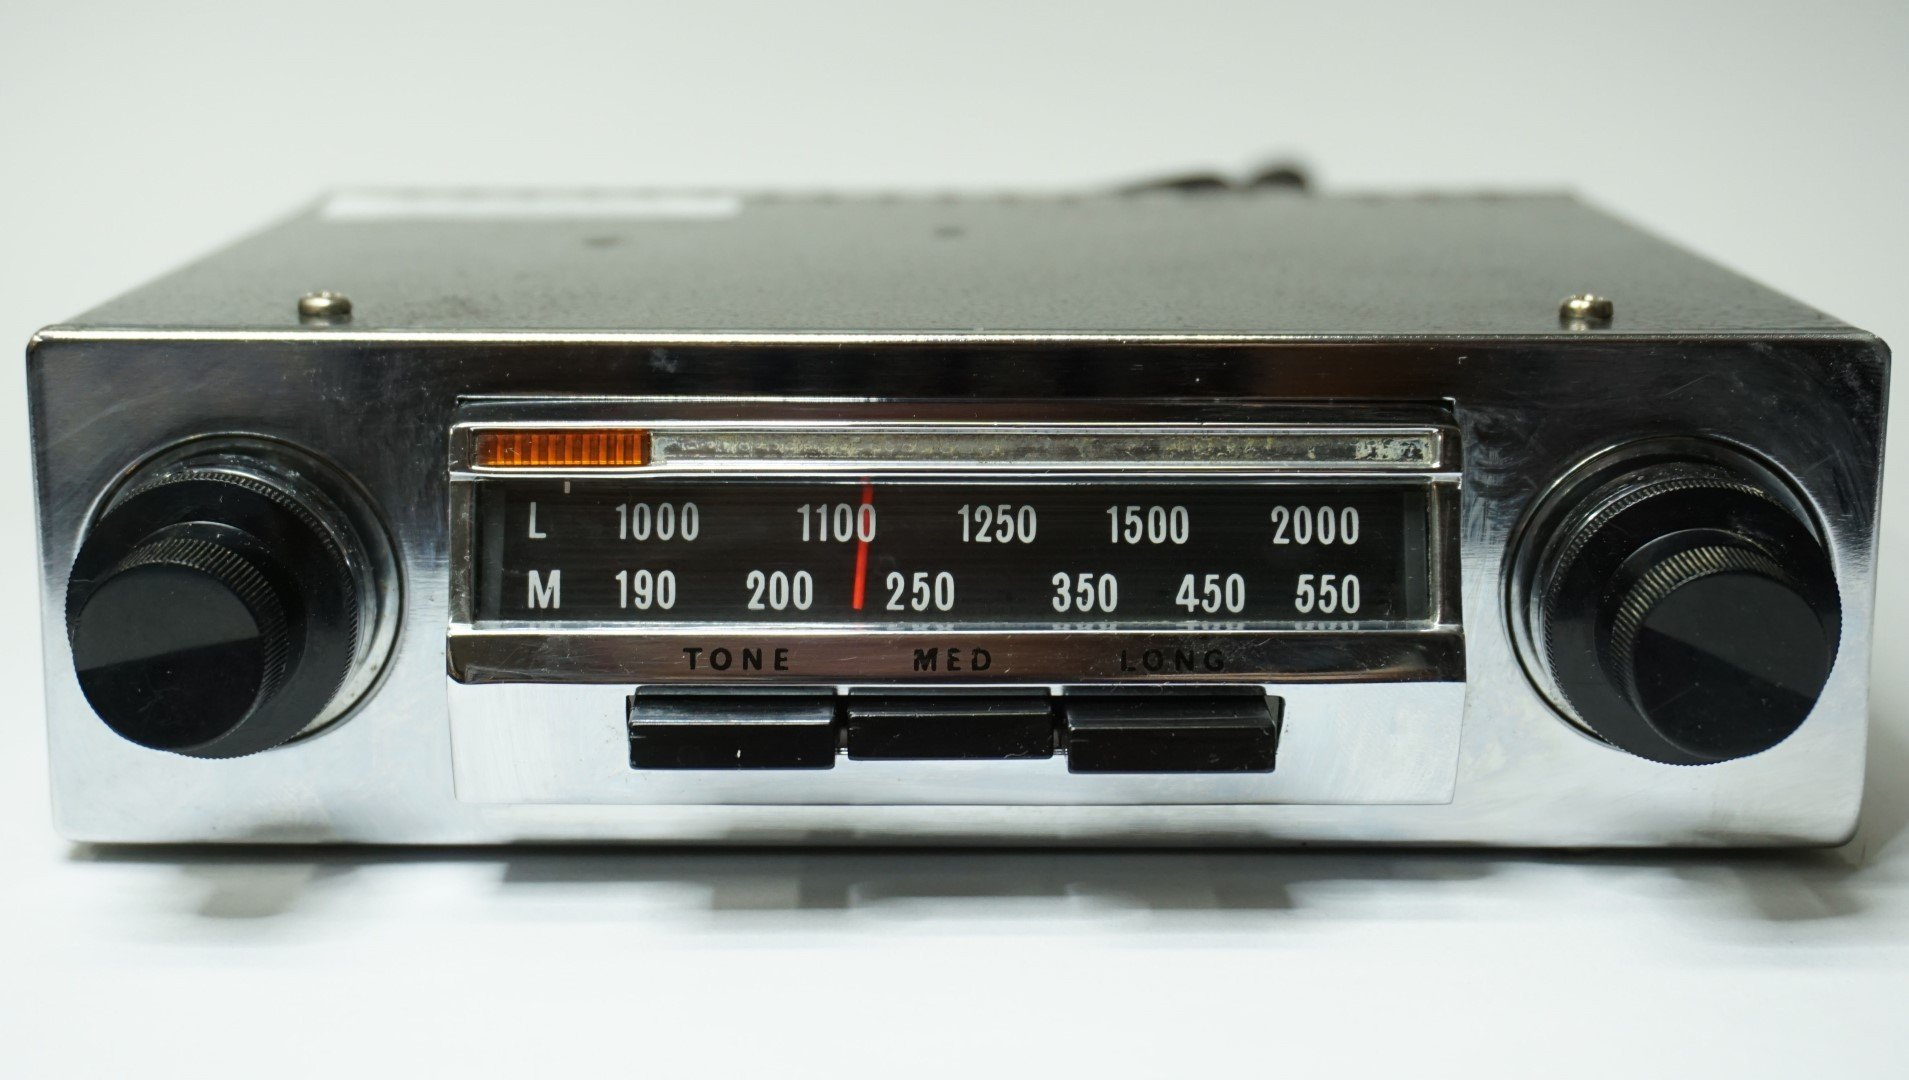 Berühmt Panasonic Radiodrahtfarben Zeitgenössisch - Elektrische ...